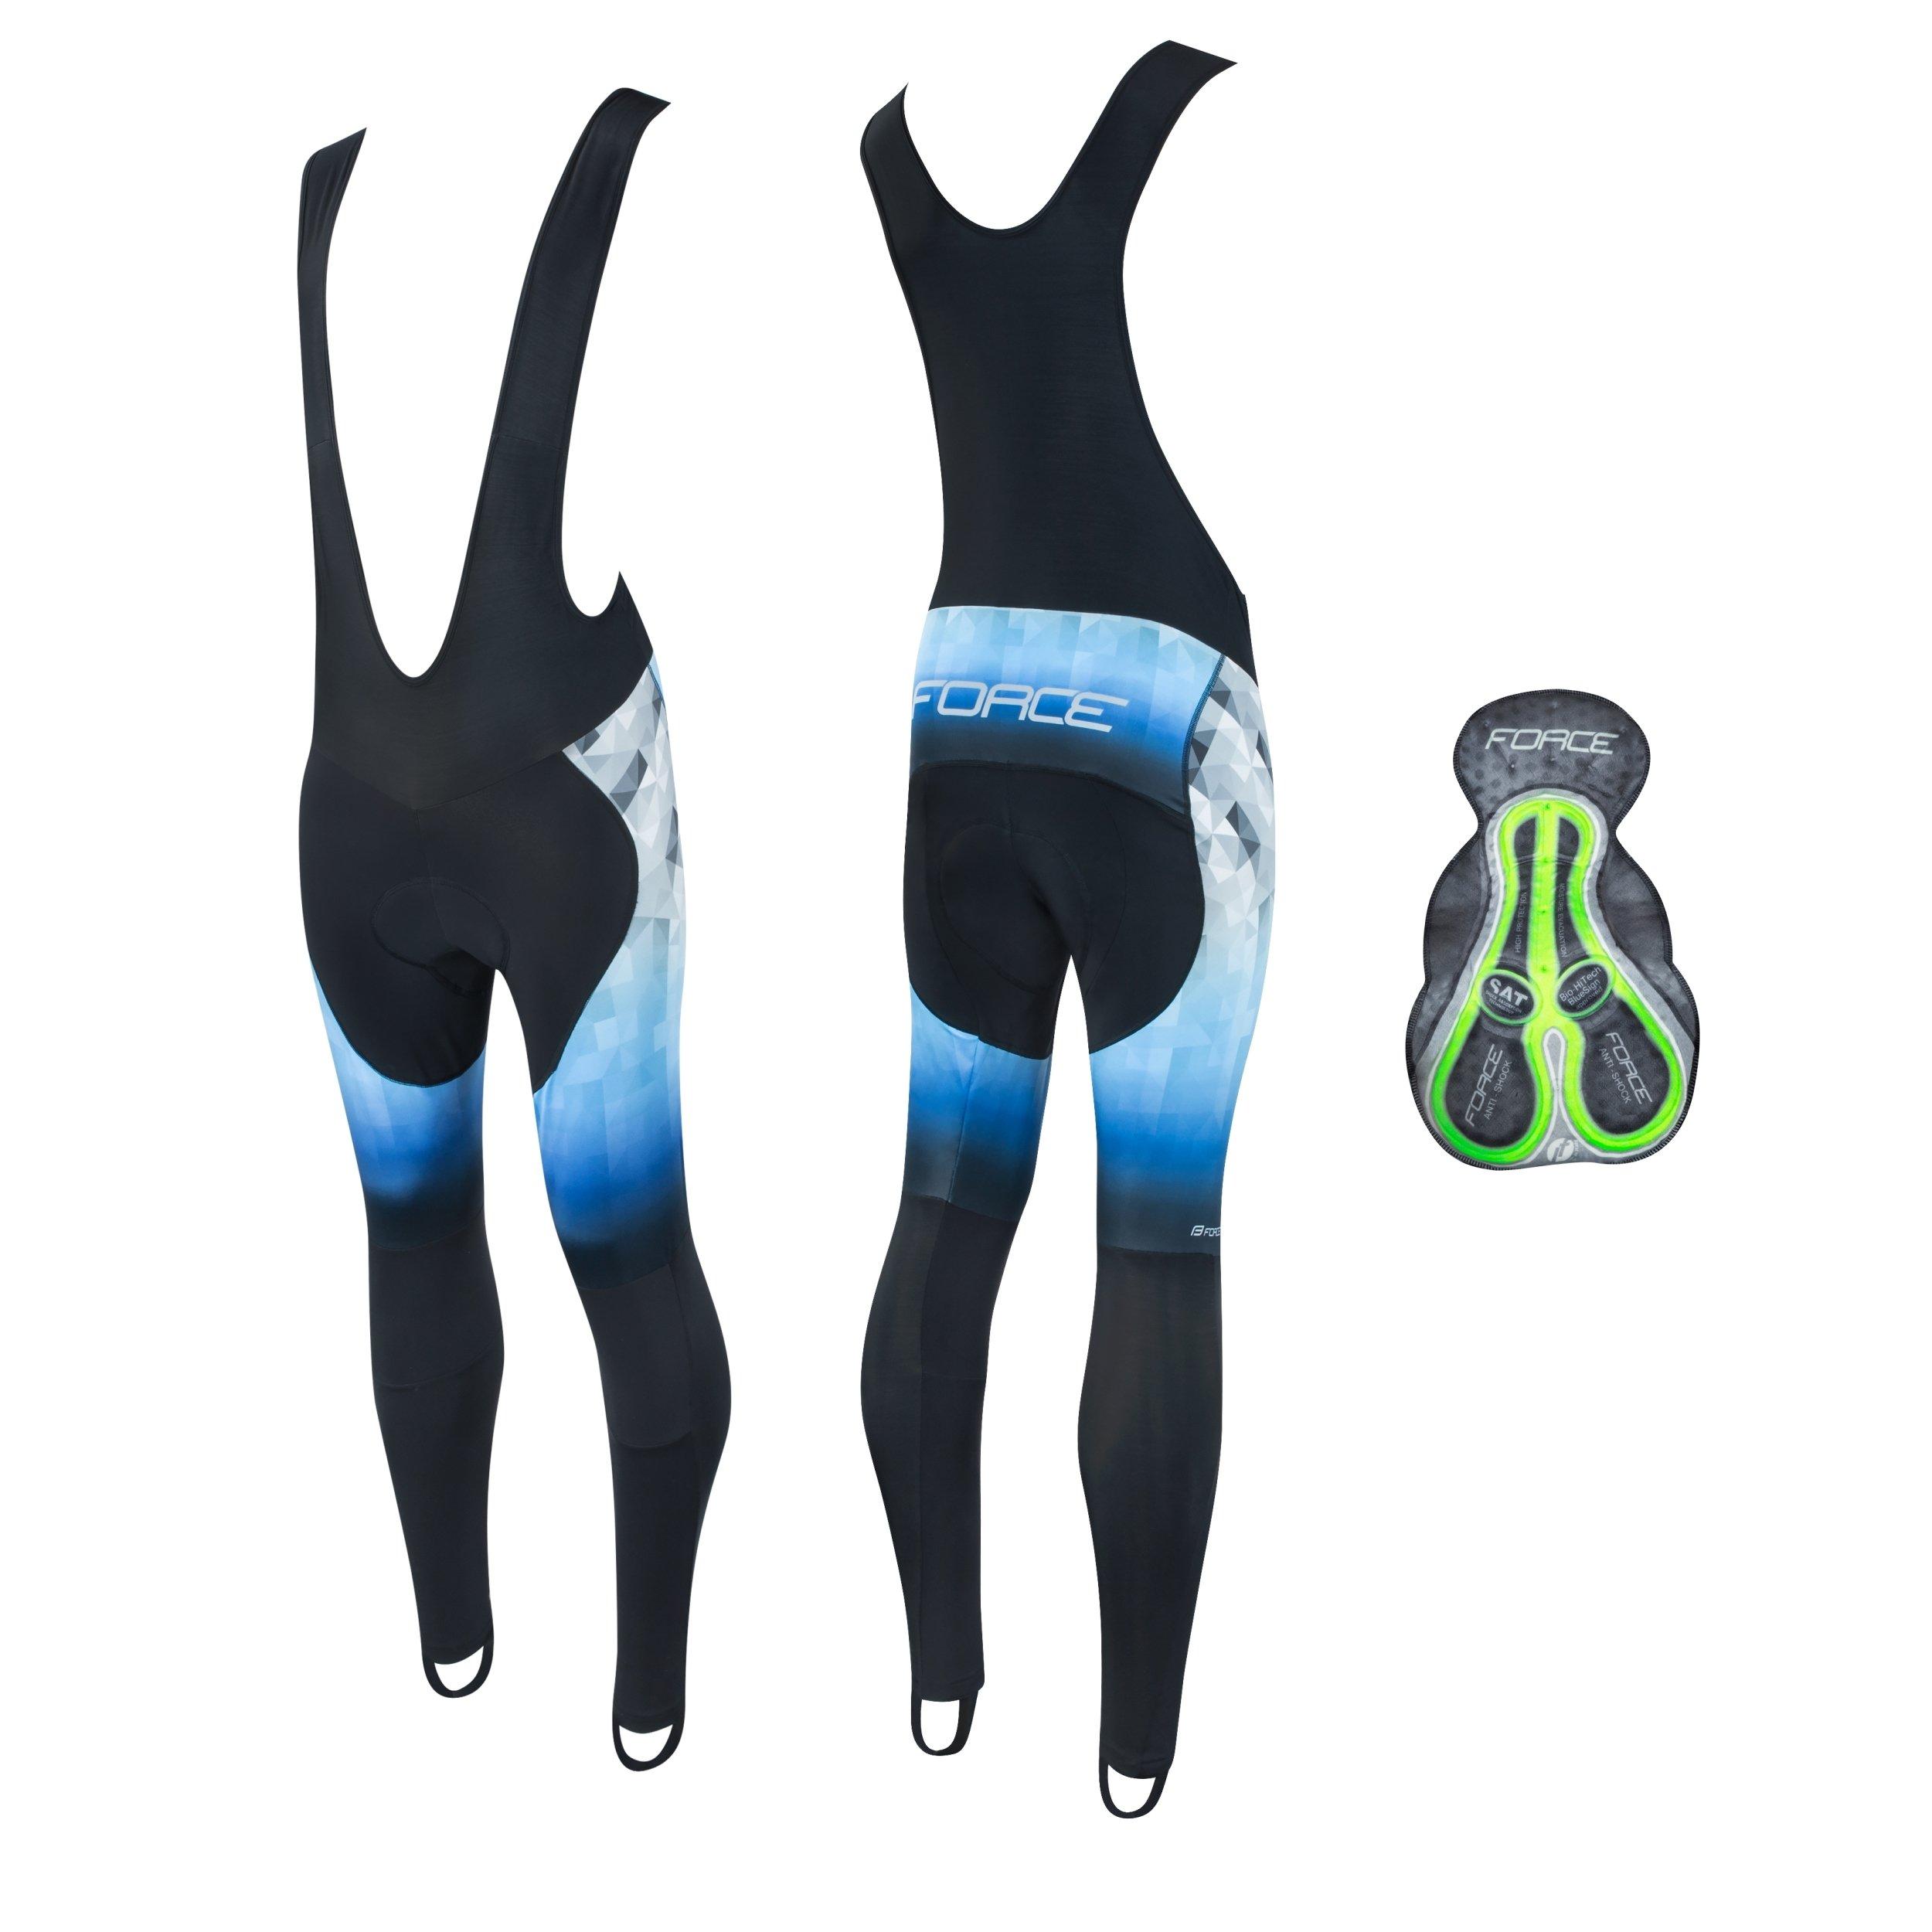 Force Dawn Wind Lange cykelbukser med seler sort/blå | Bukser